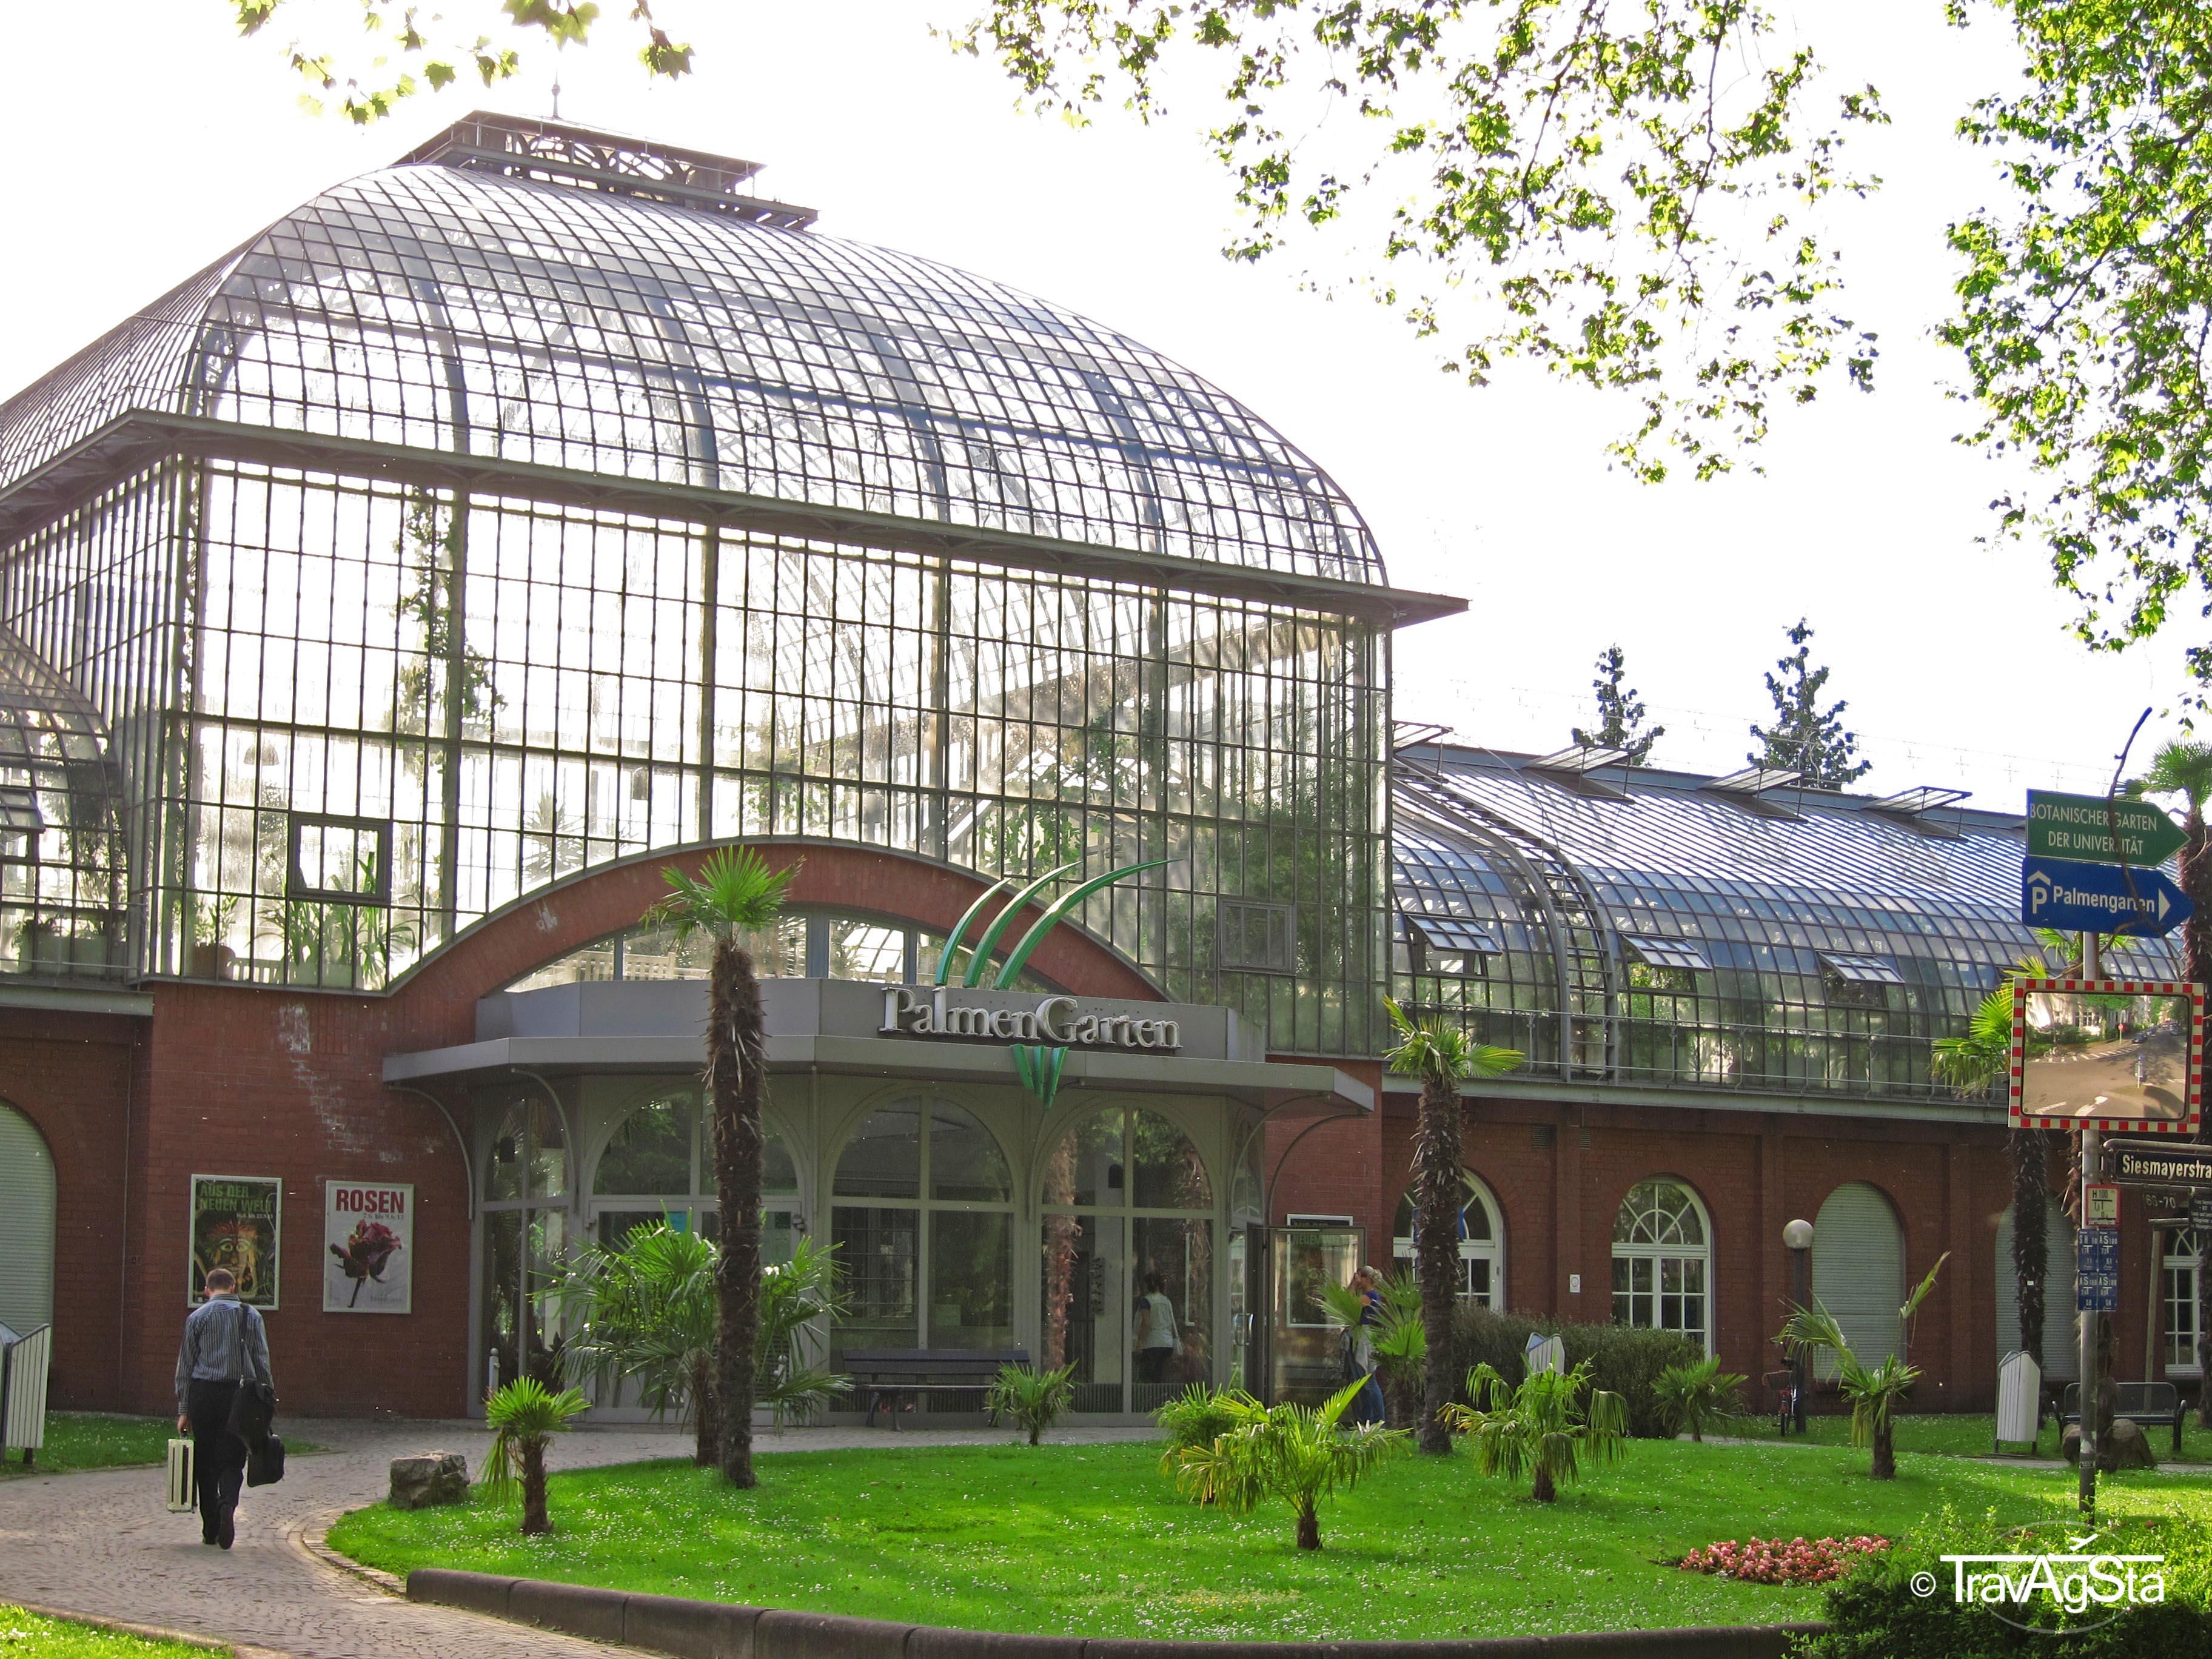 Palmengarten, Frankfurt am Main, Germany